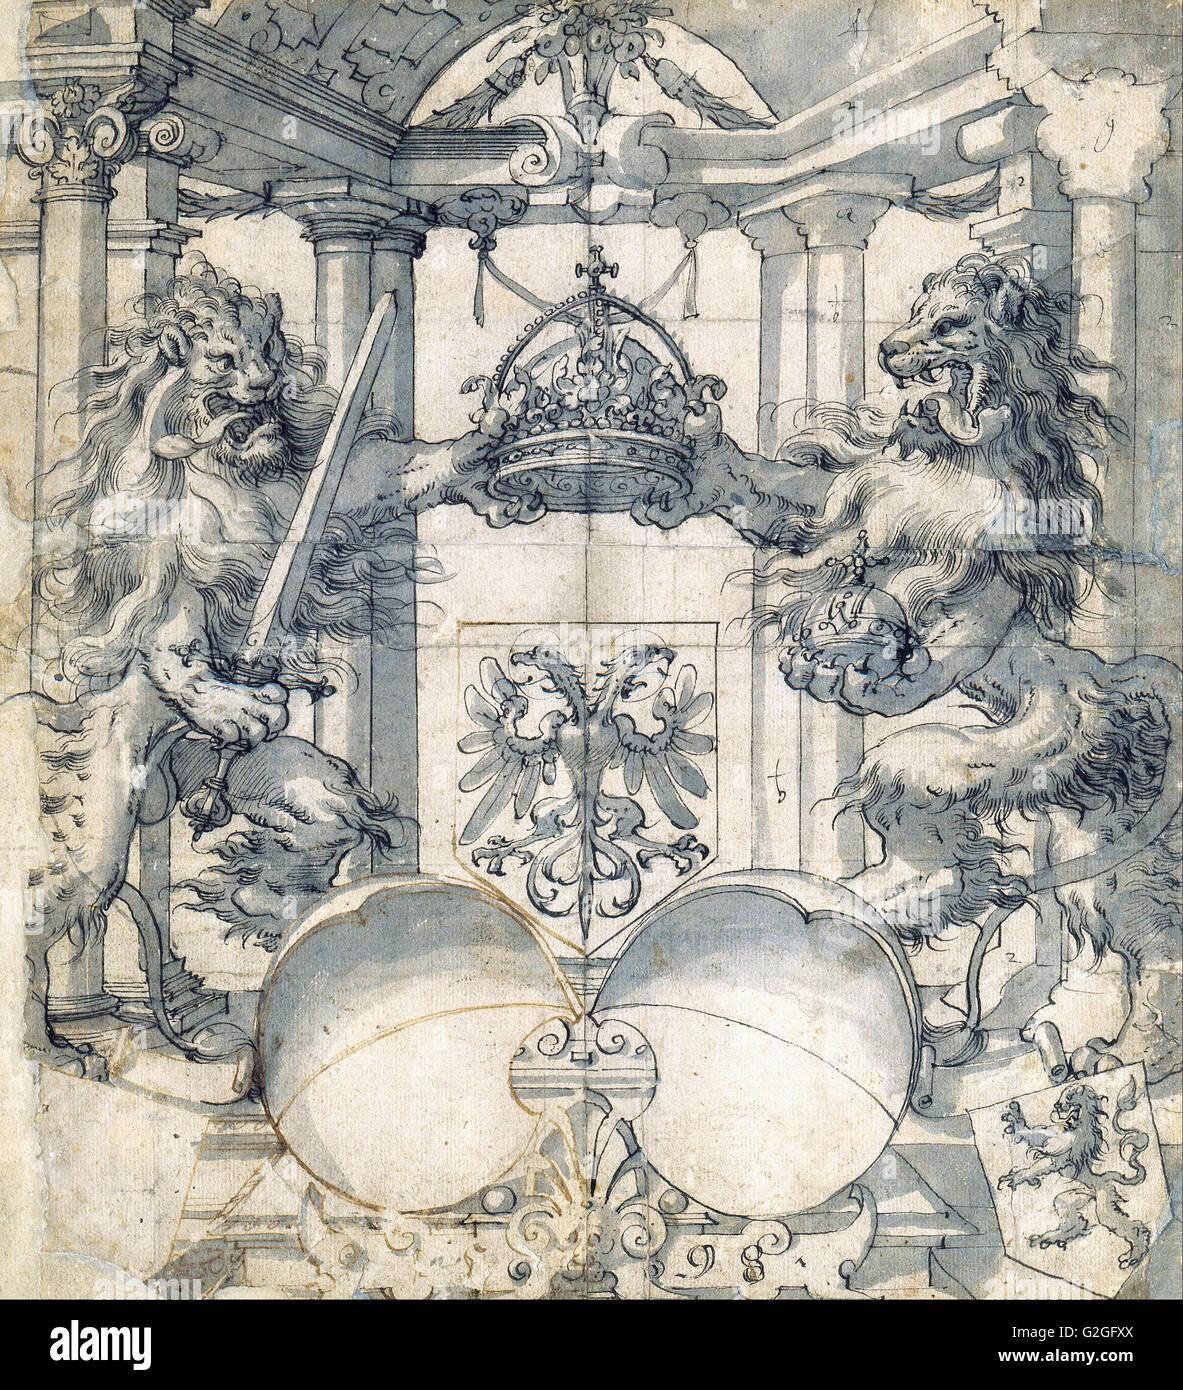 Christoph Murer - Cartoon for a Stained-Glass Window - Museum Kunstpalast, Düsseldorf - Stock Image